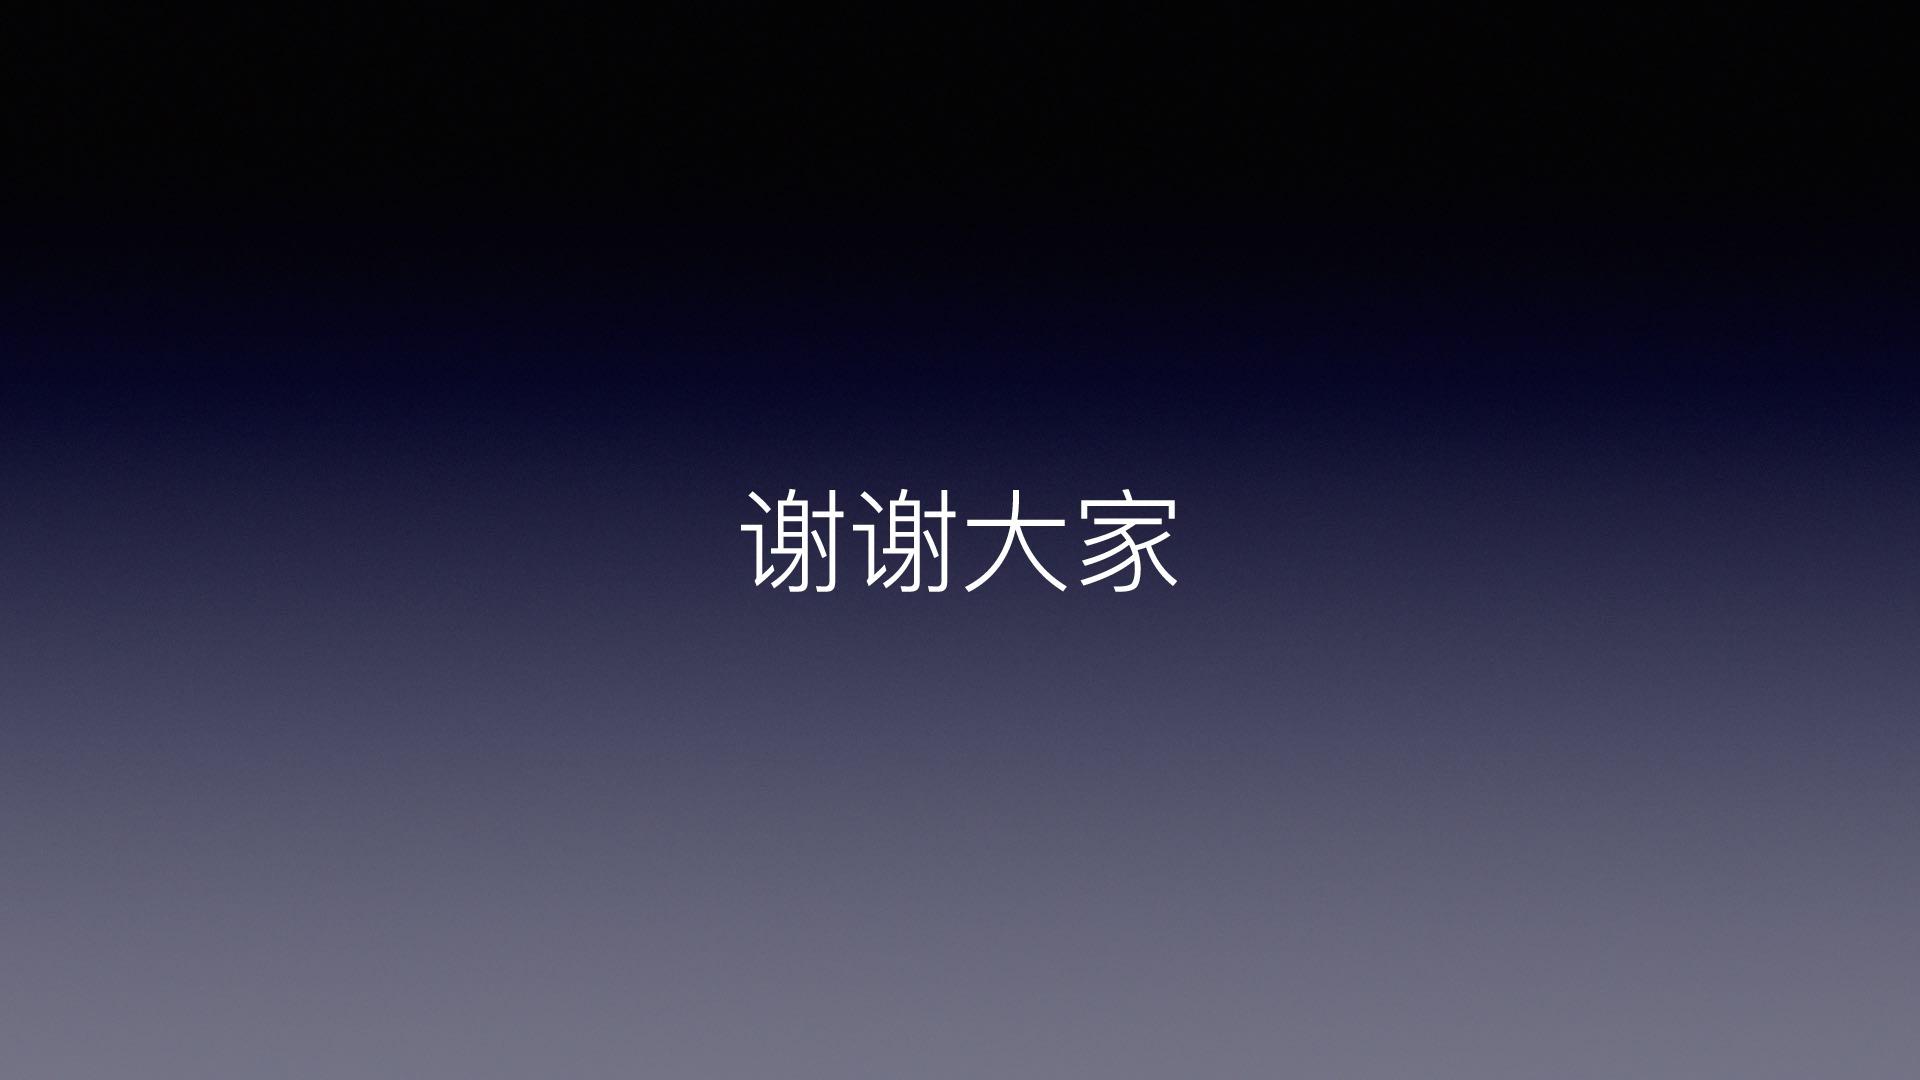 https://opentalk-blog.b0.upaiyun.com/prod/2017-10-31/d8af111749f056fe298487d8f09d85ac